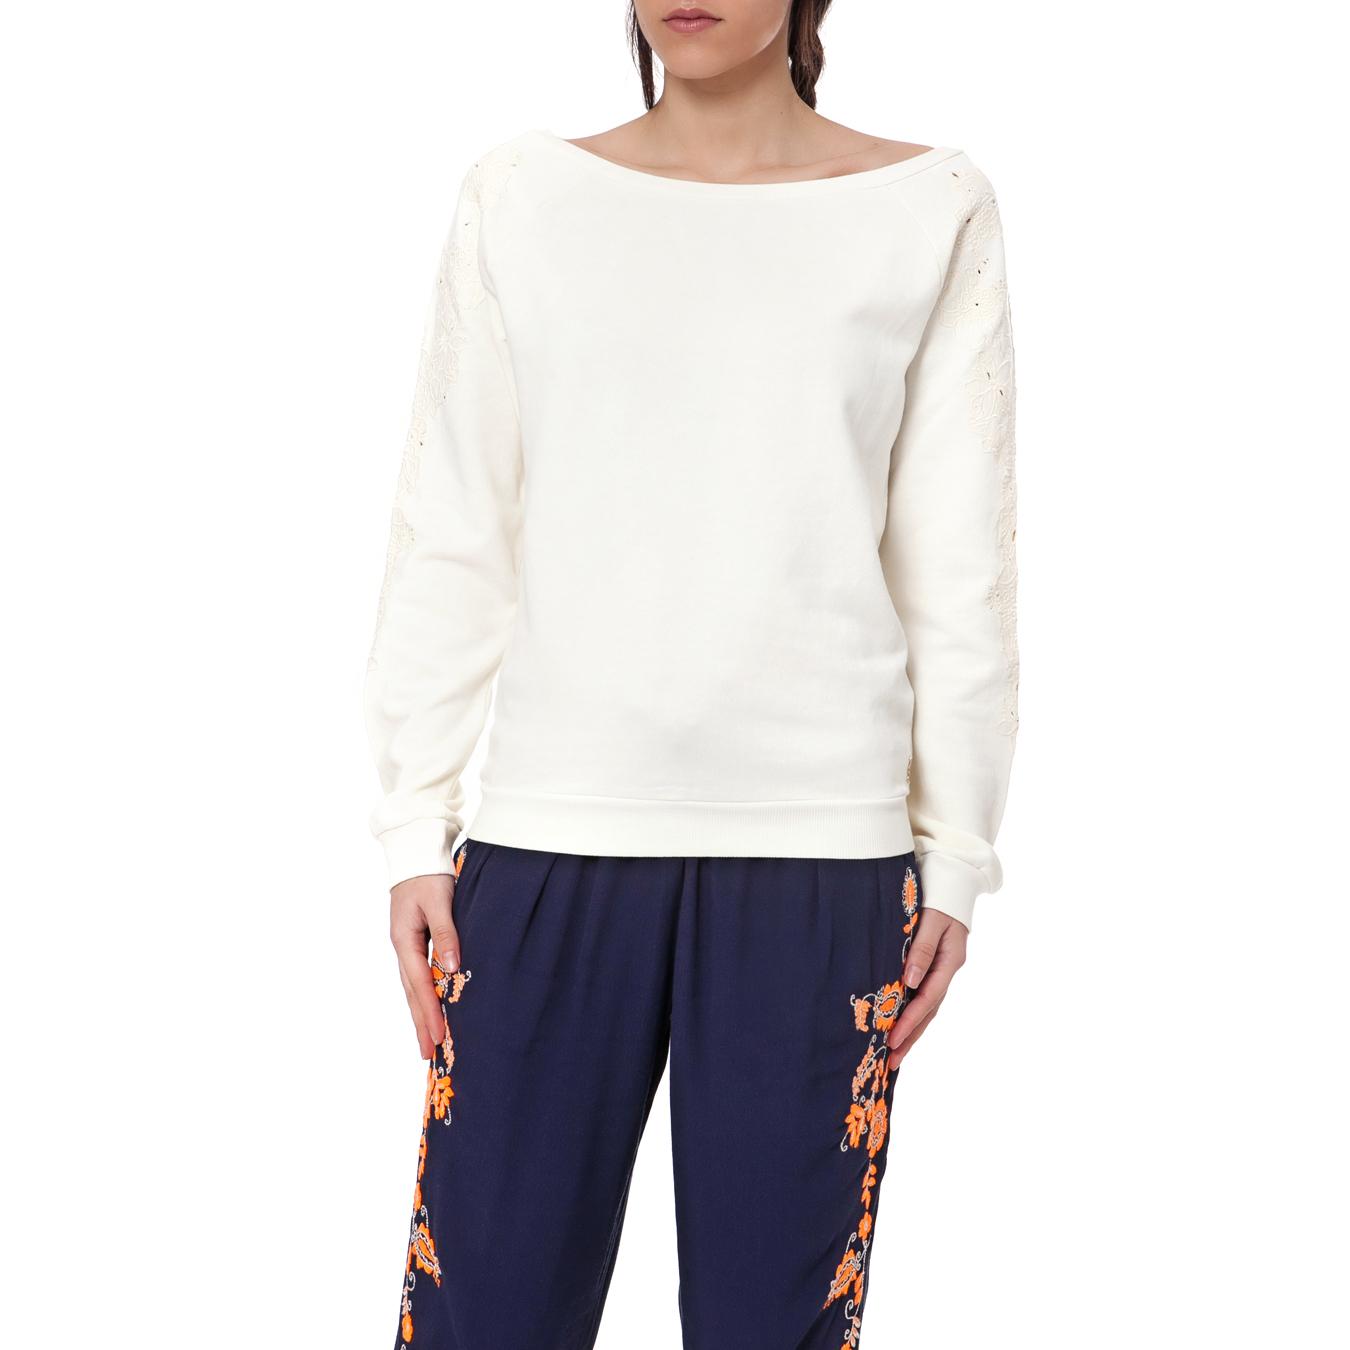 JUICY COUTURE - Γυναικείο πουλόβερ Juicy Couture εκρού γυναικεία ρούχα πλεκτά ζακέτες πουλόβερ